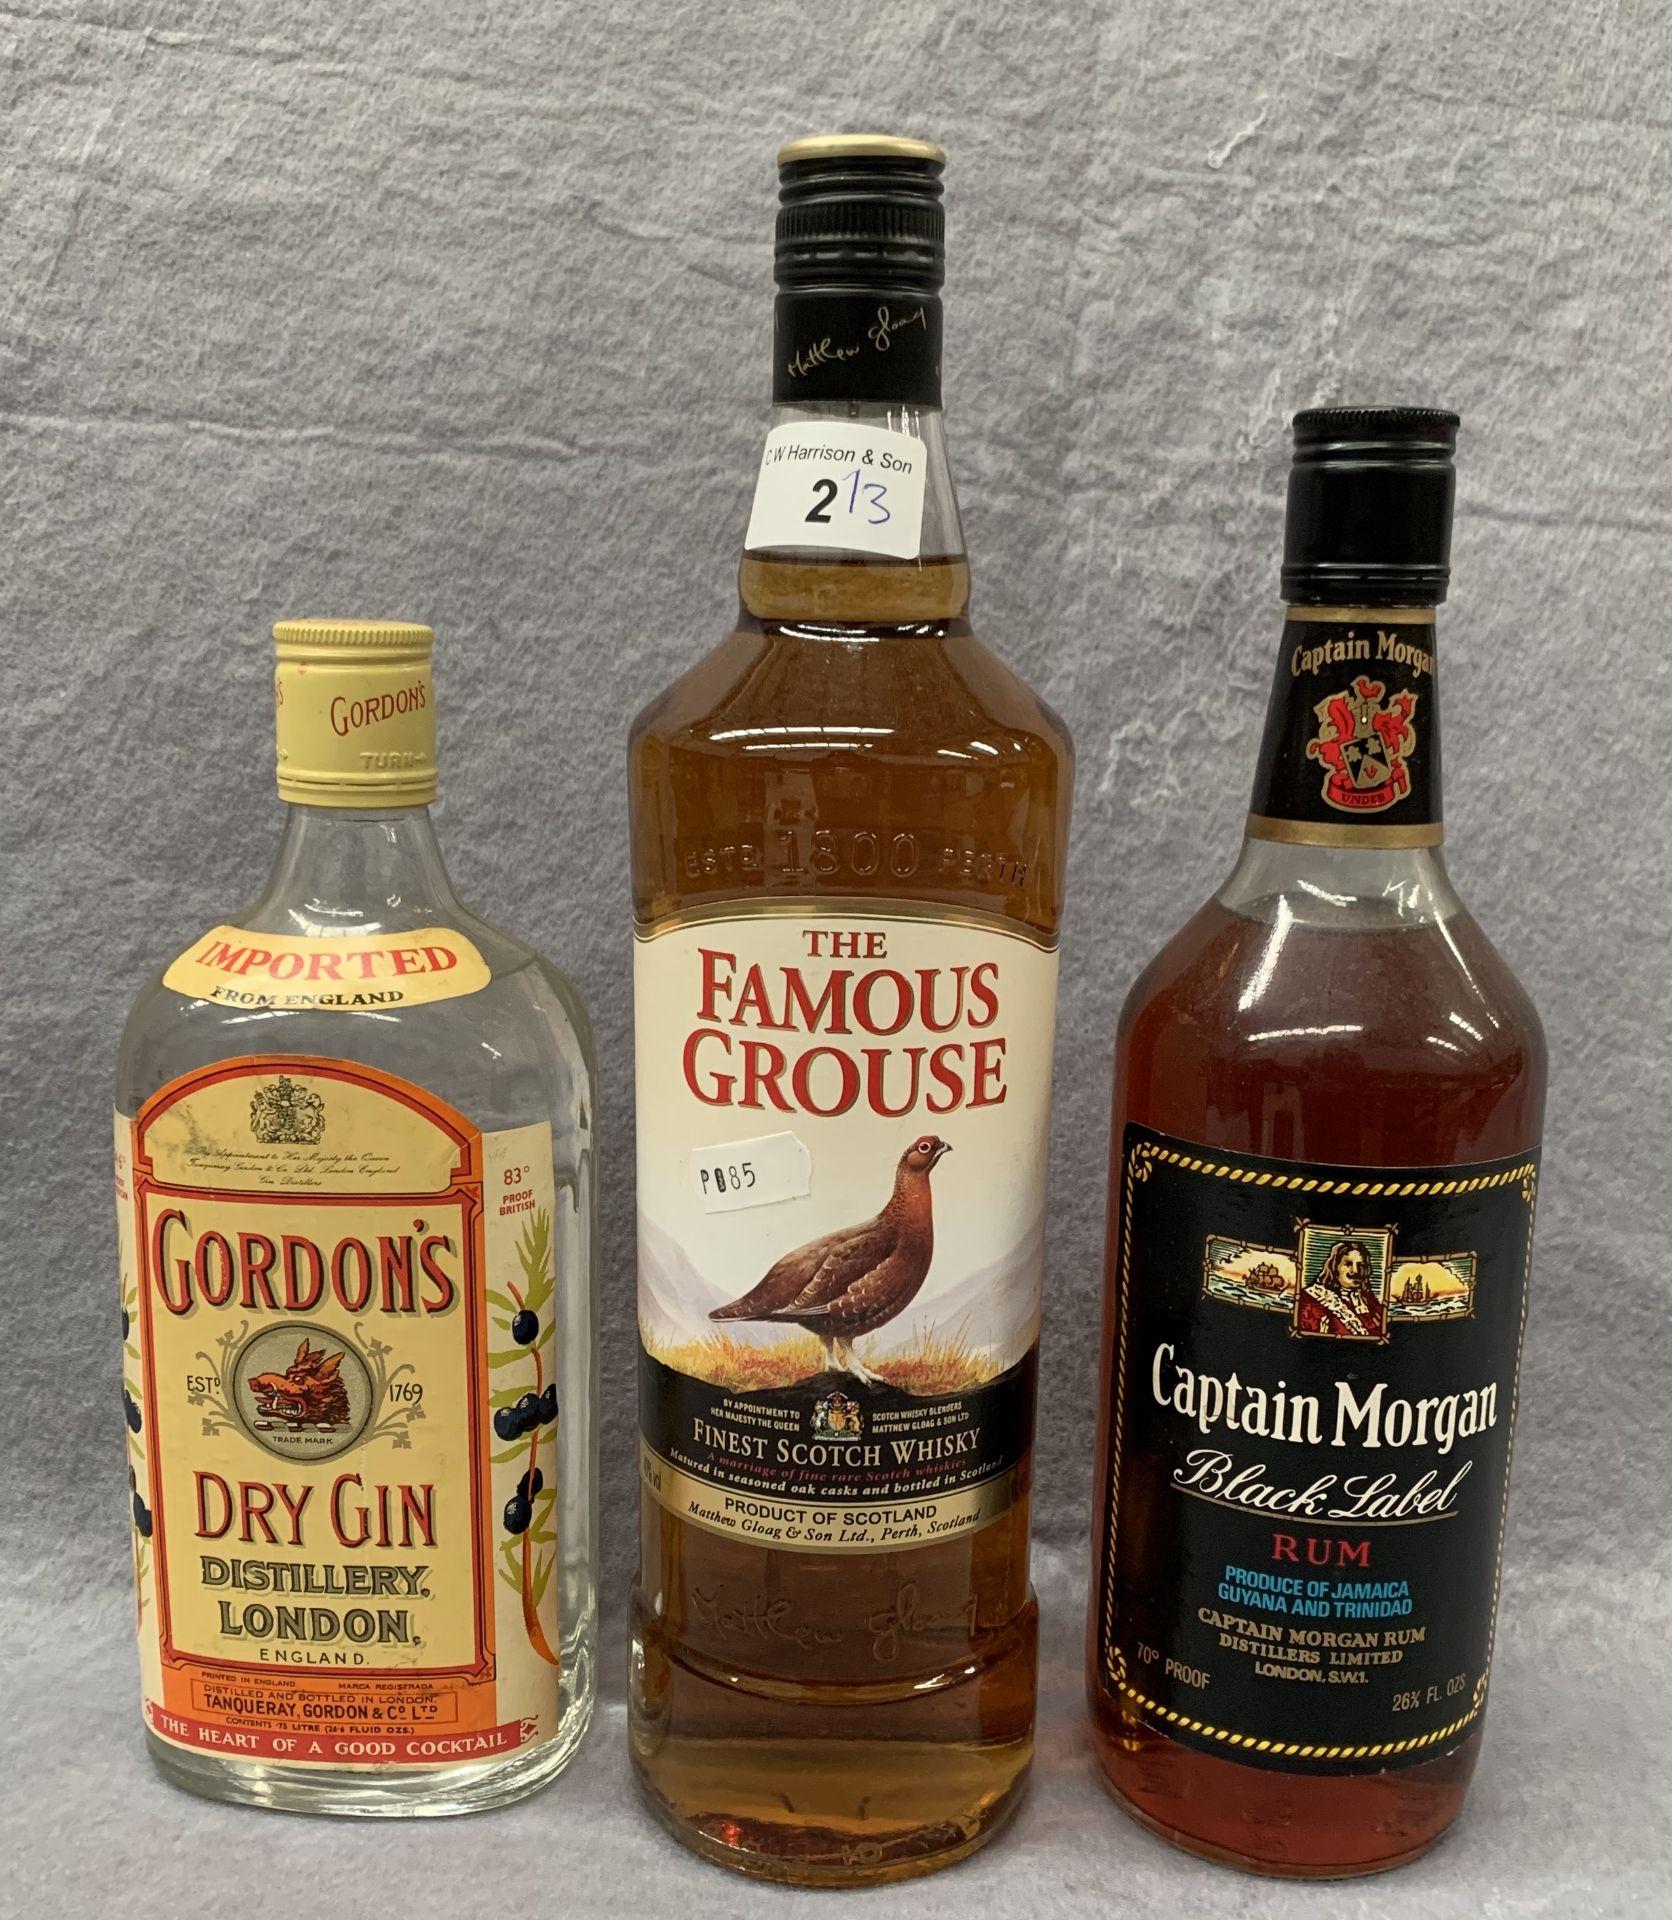 Lot 2 - A 1 litre bottle of Famous Grouse Whisky, a 26.